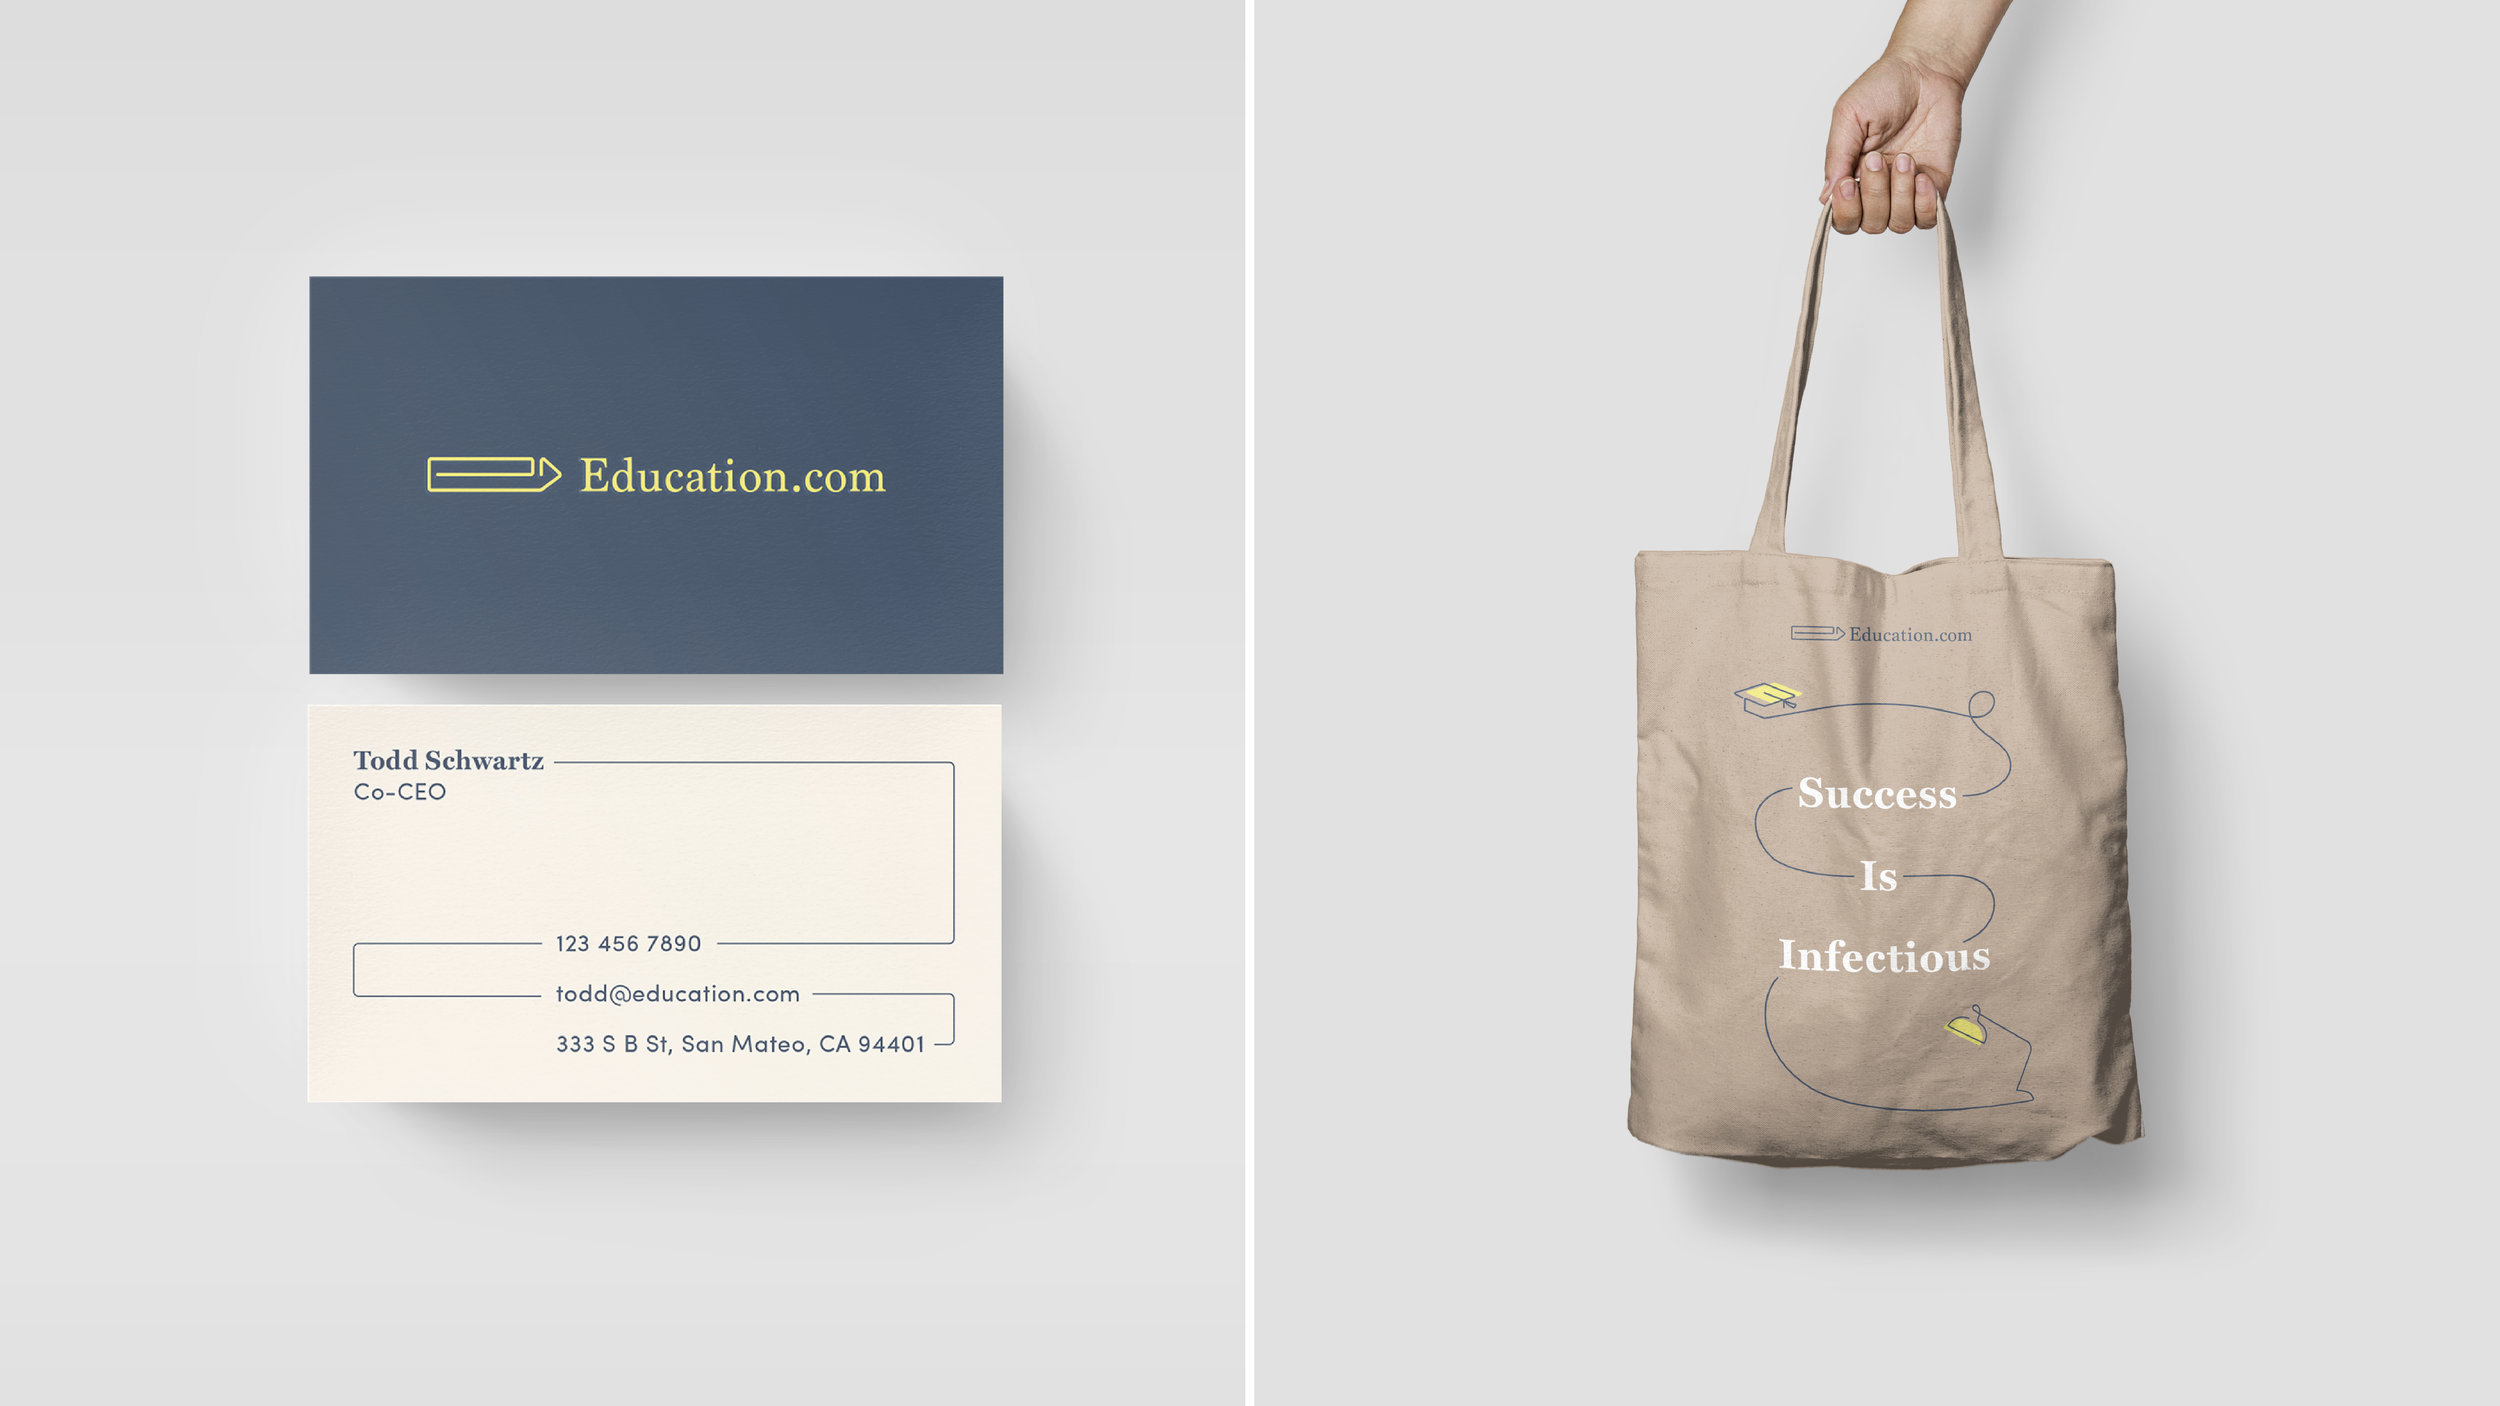 Education.com_BrandIdentity_Template_BH_D15.jpg